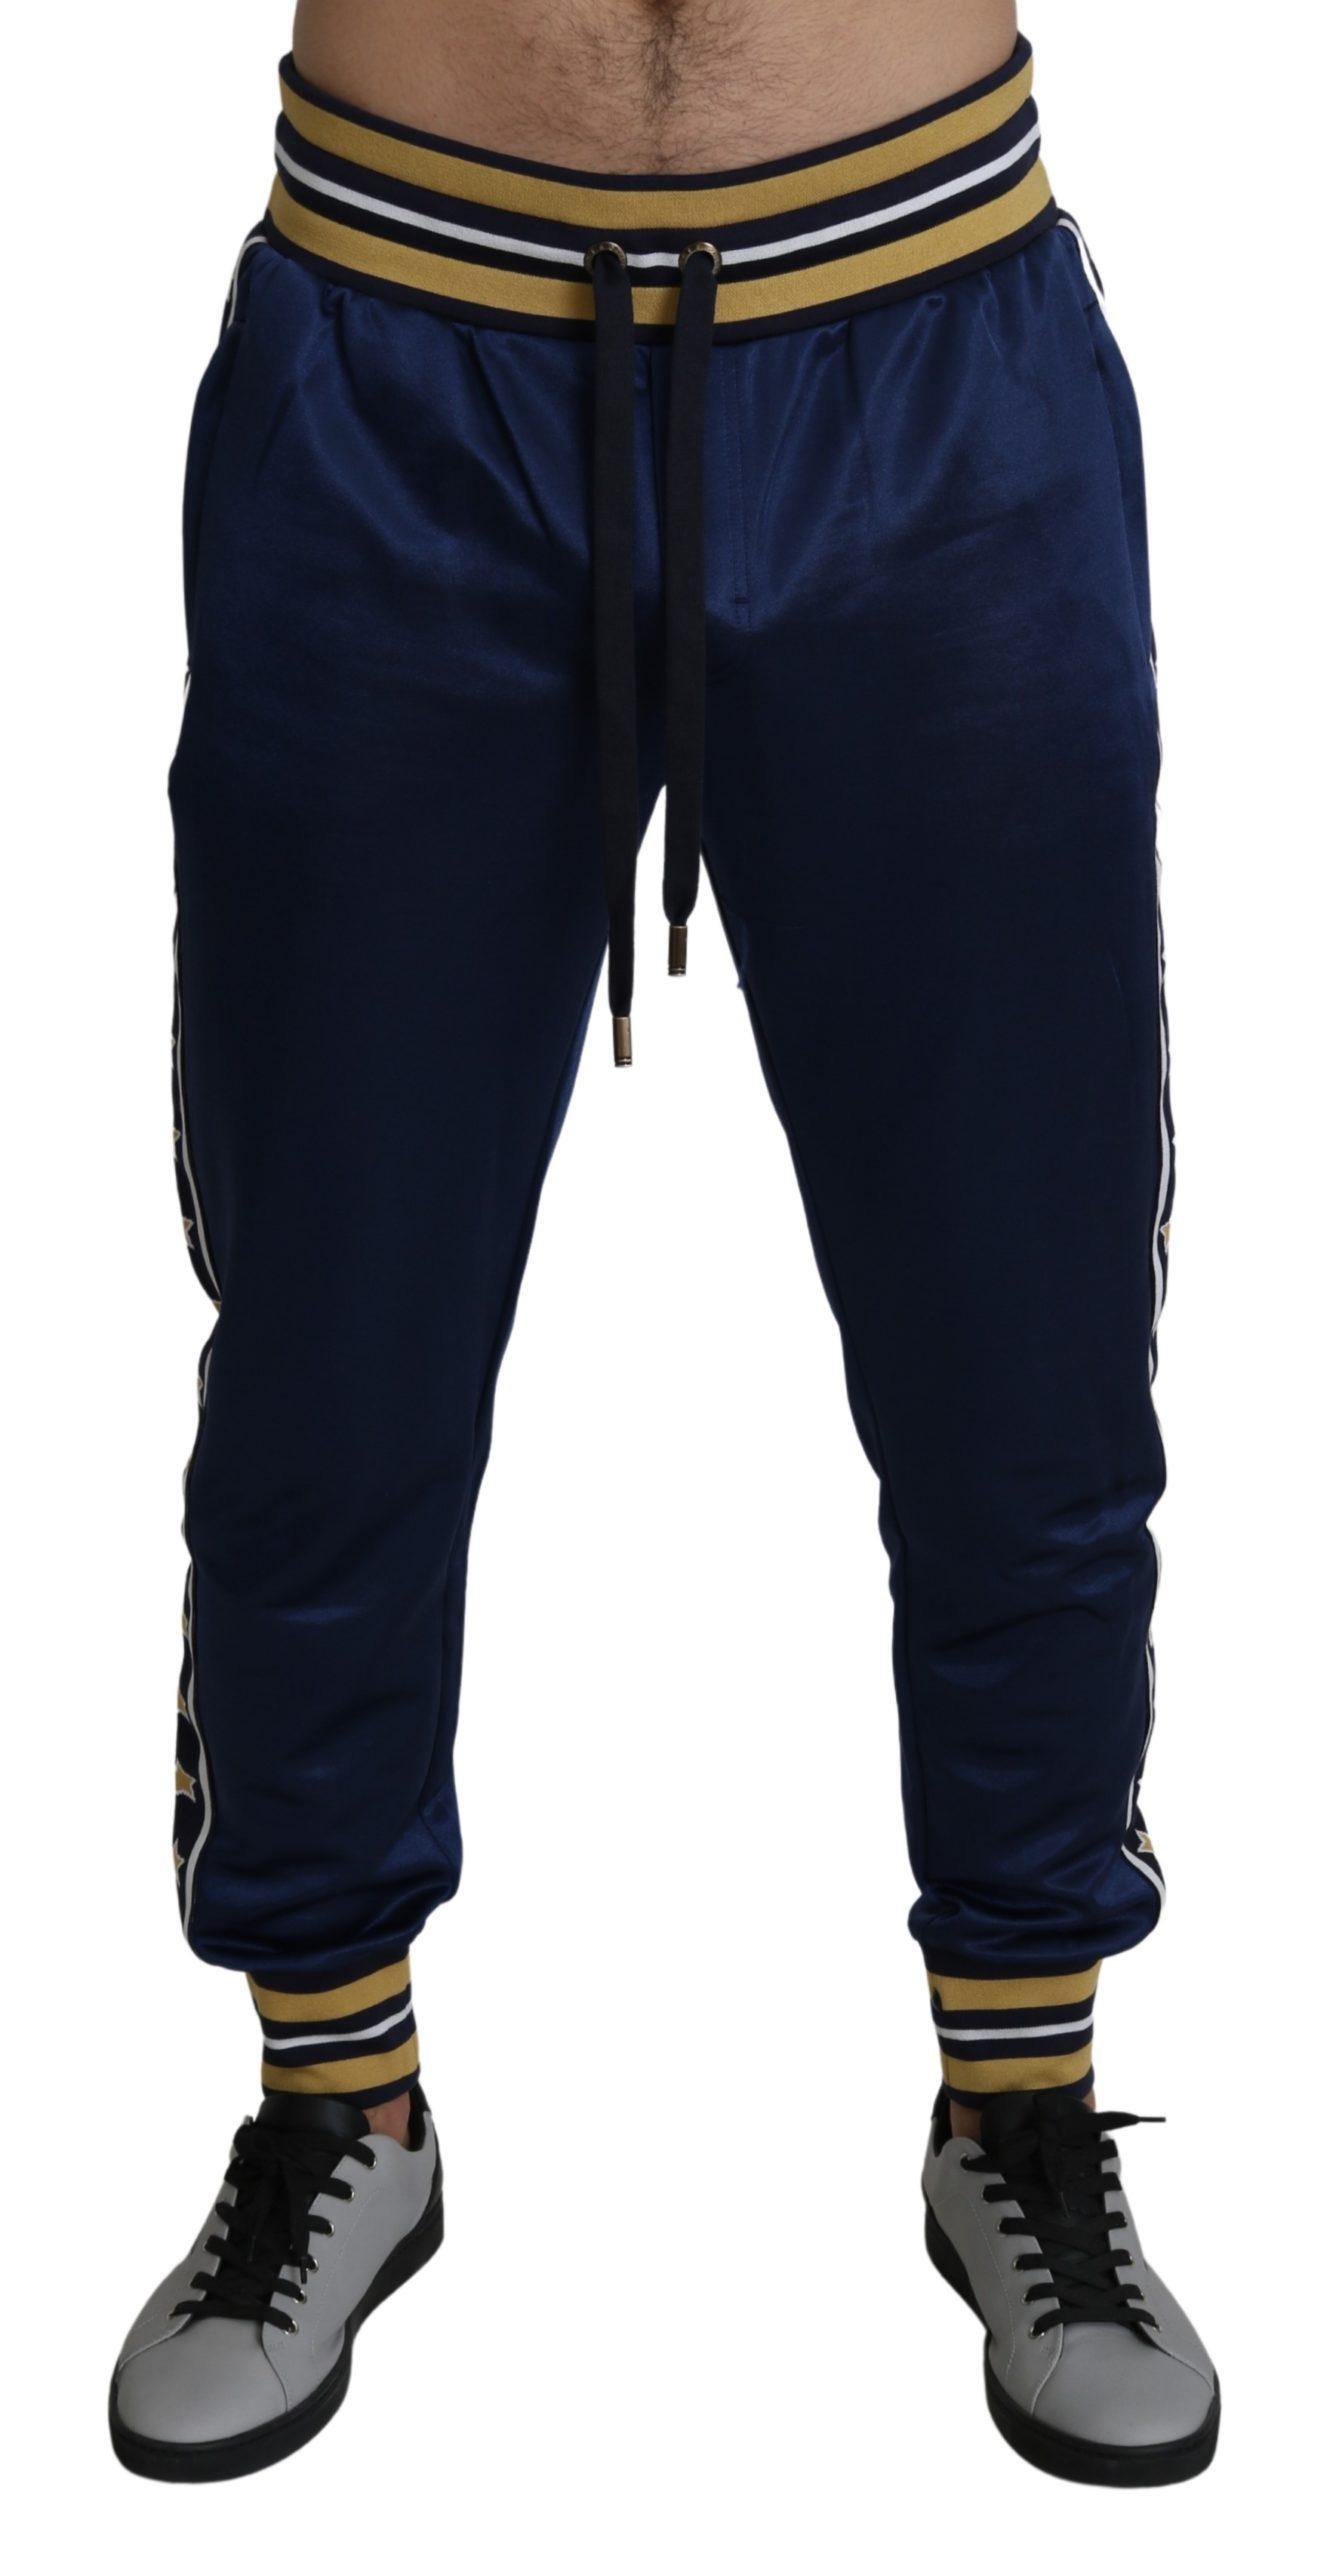 Dolce & Gabbana Men's Nylon Stars King Casual Trouser Blue PAN71395 - IT50 | L